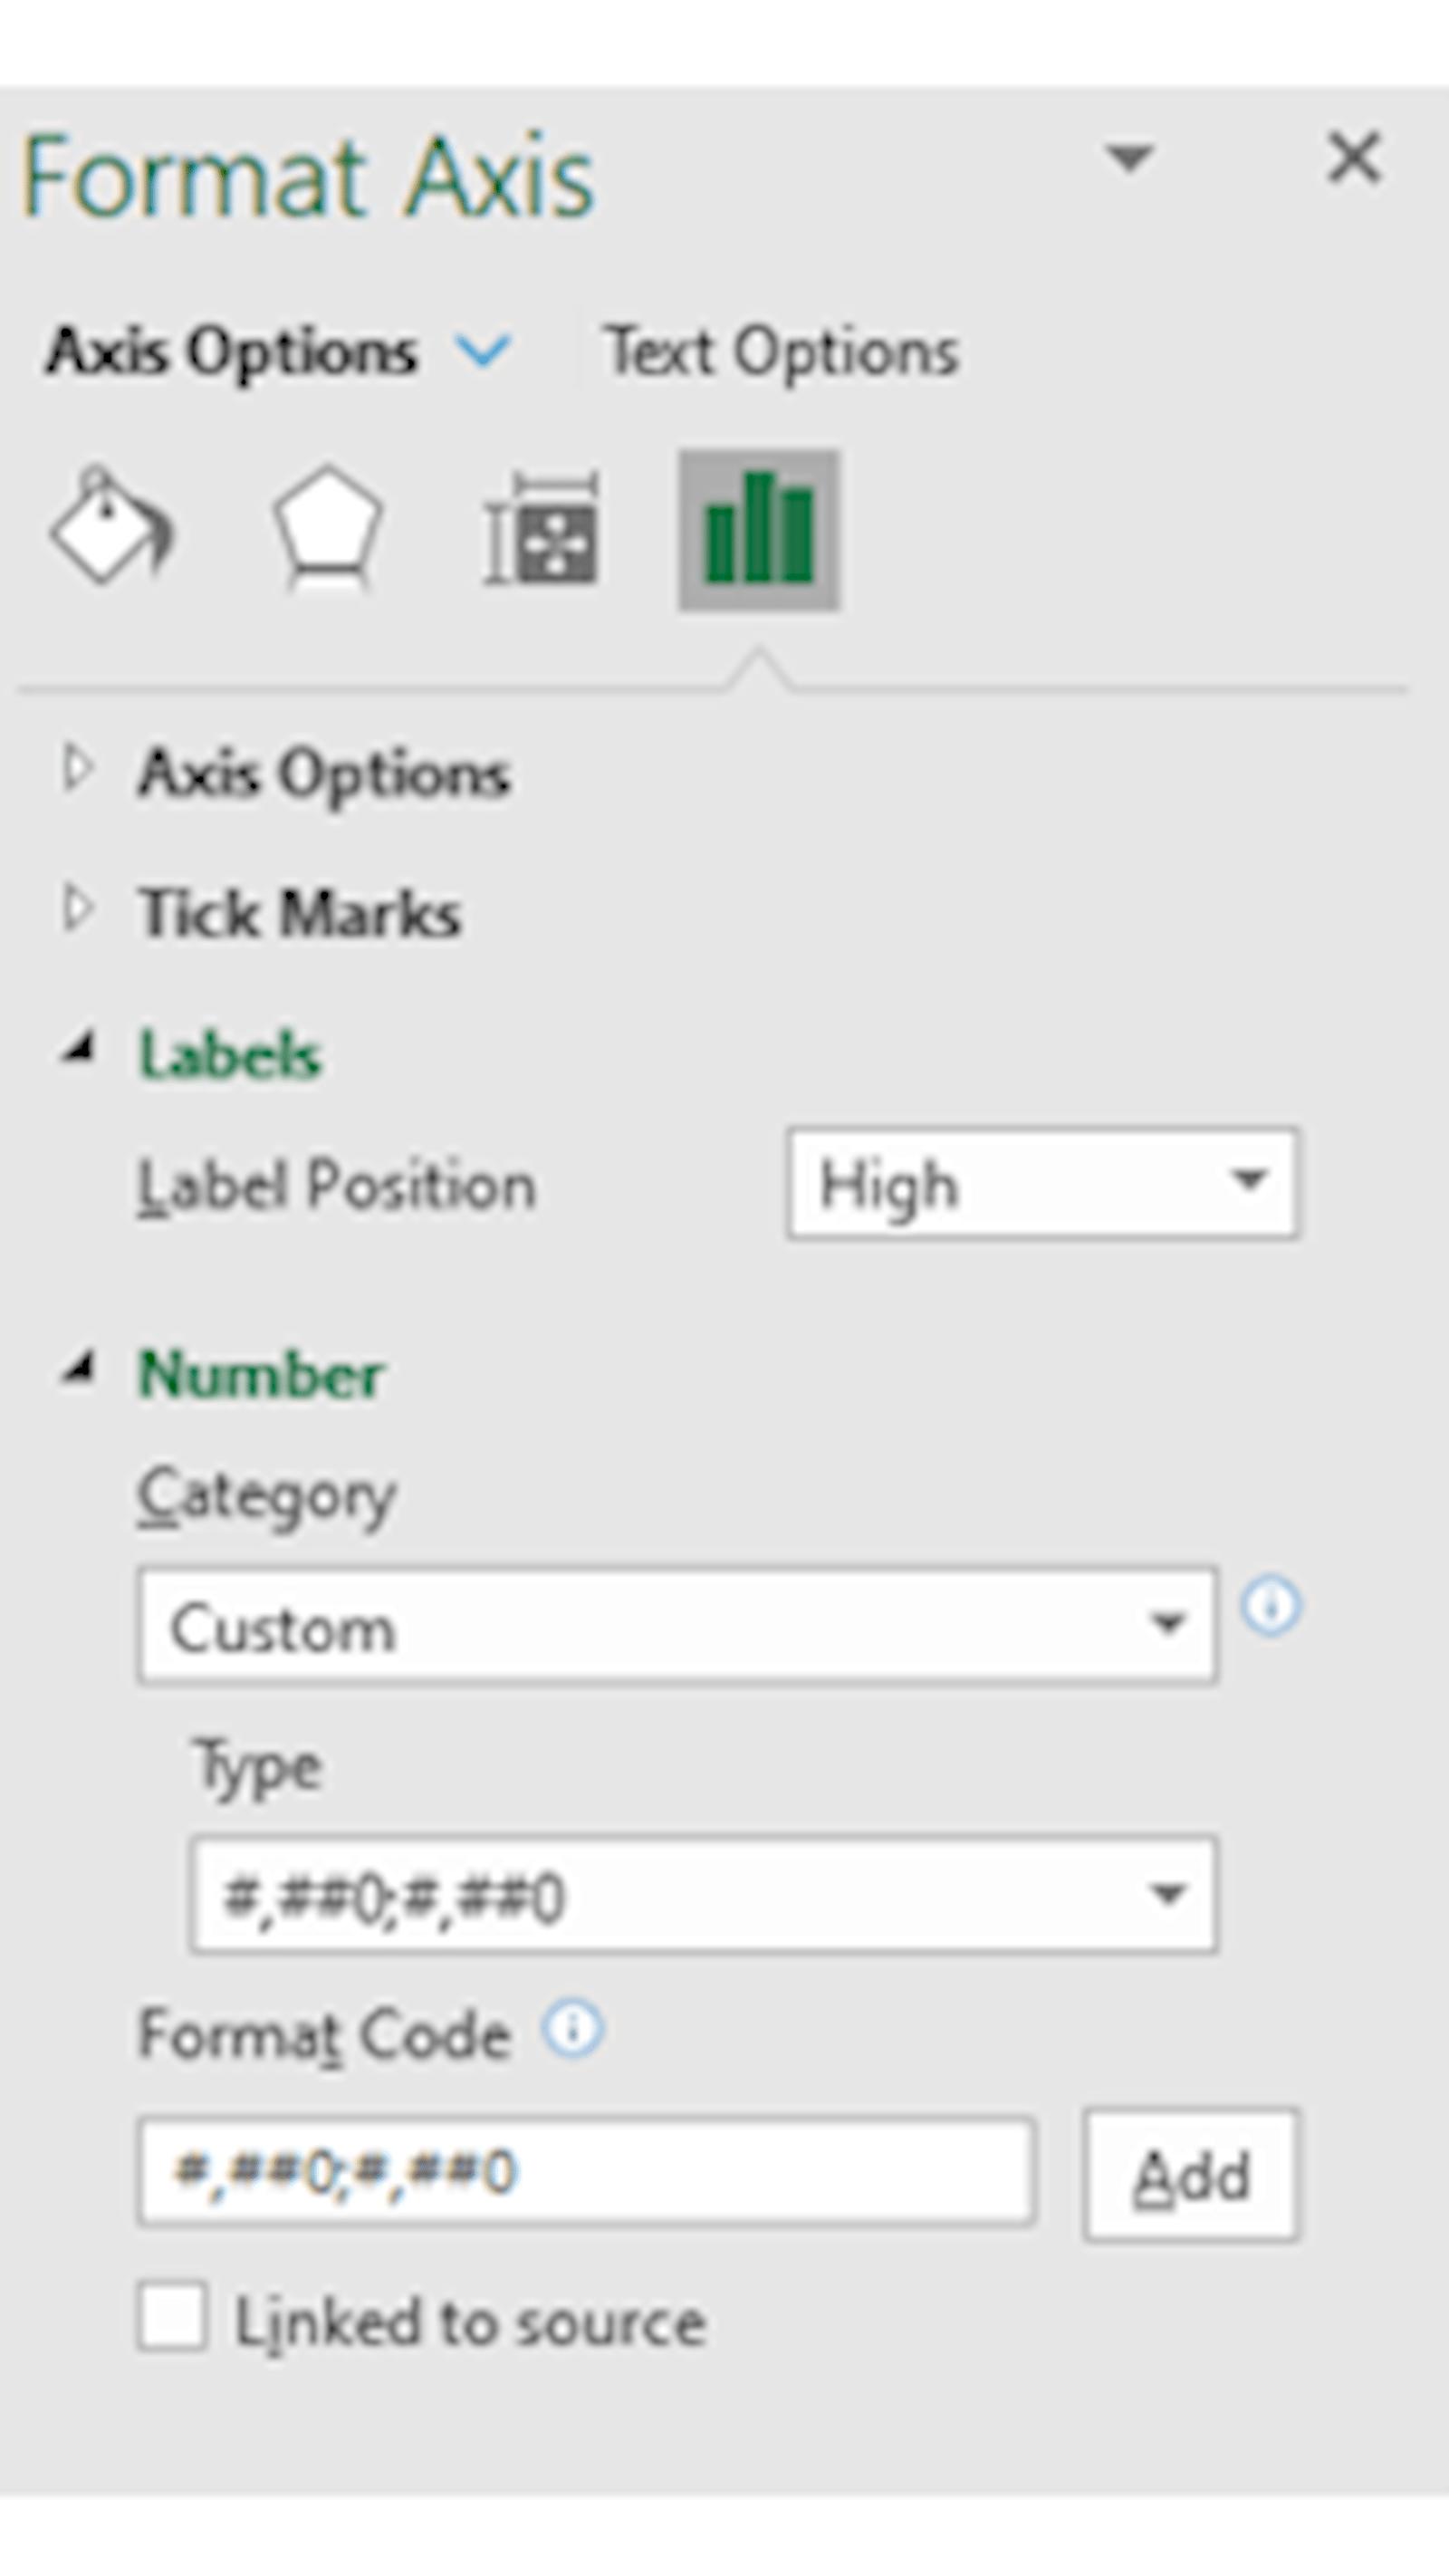 Image of Excel format axis menu